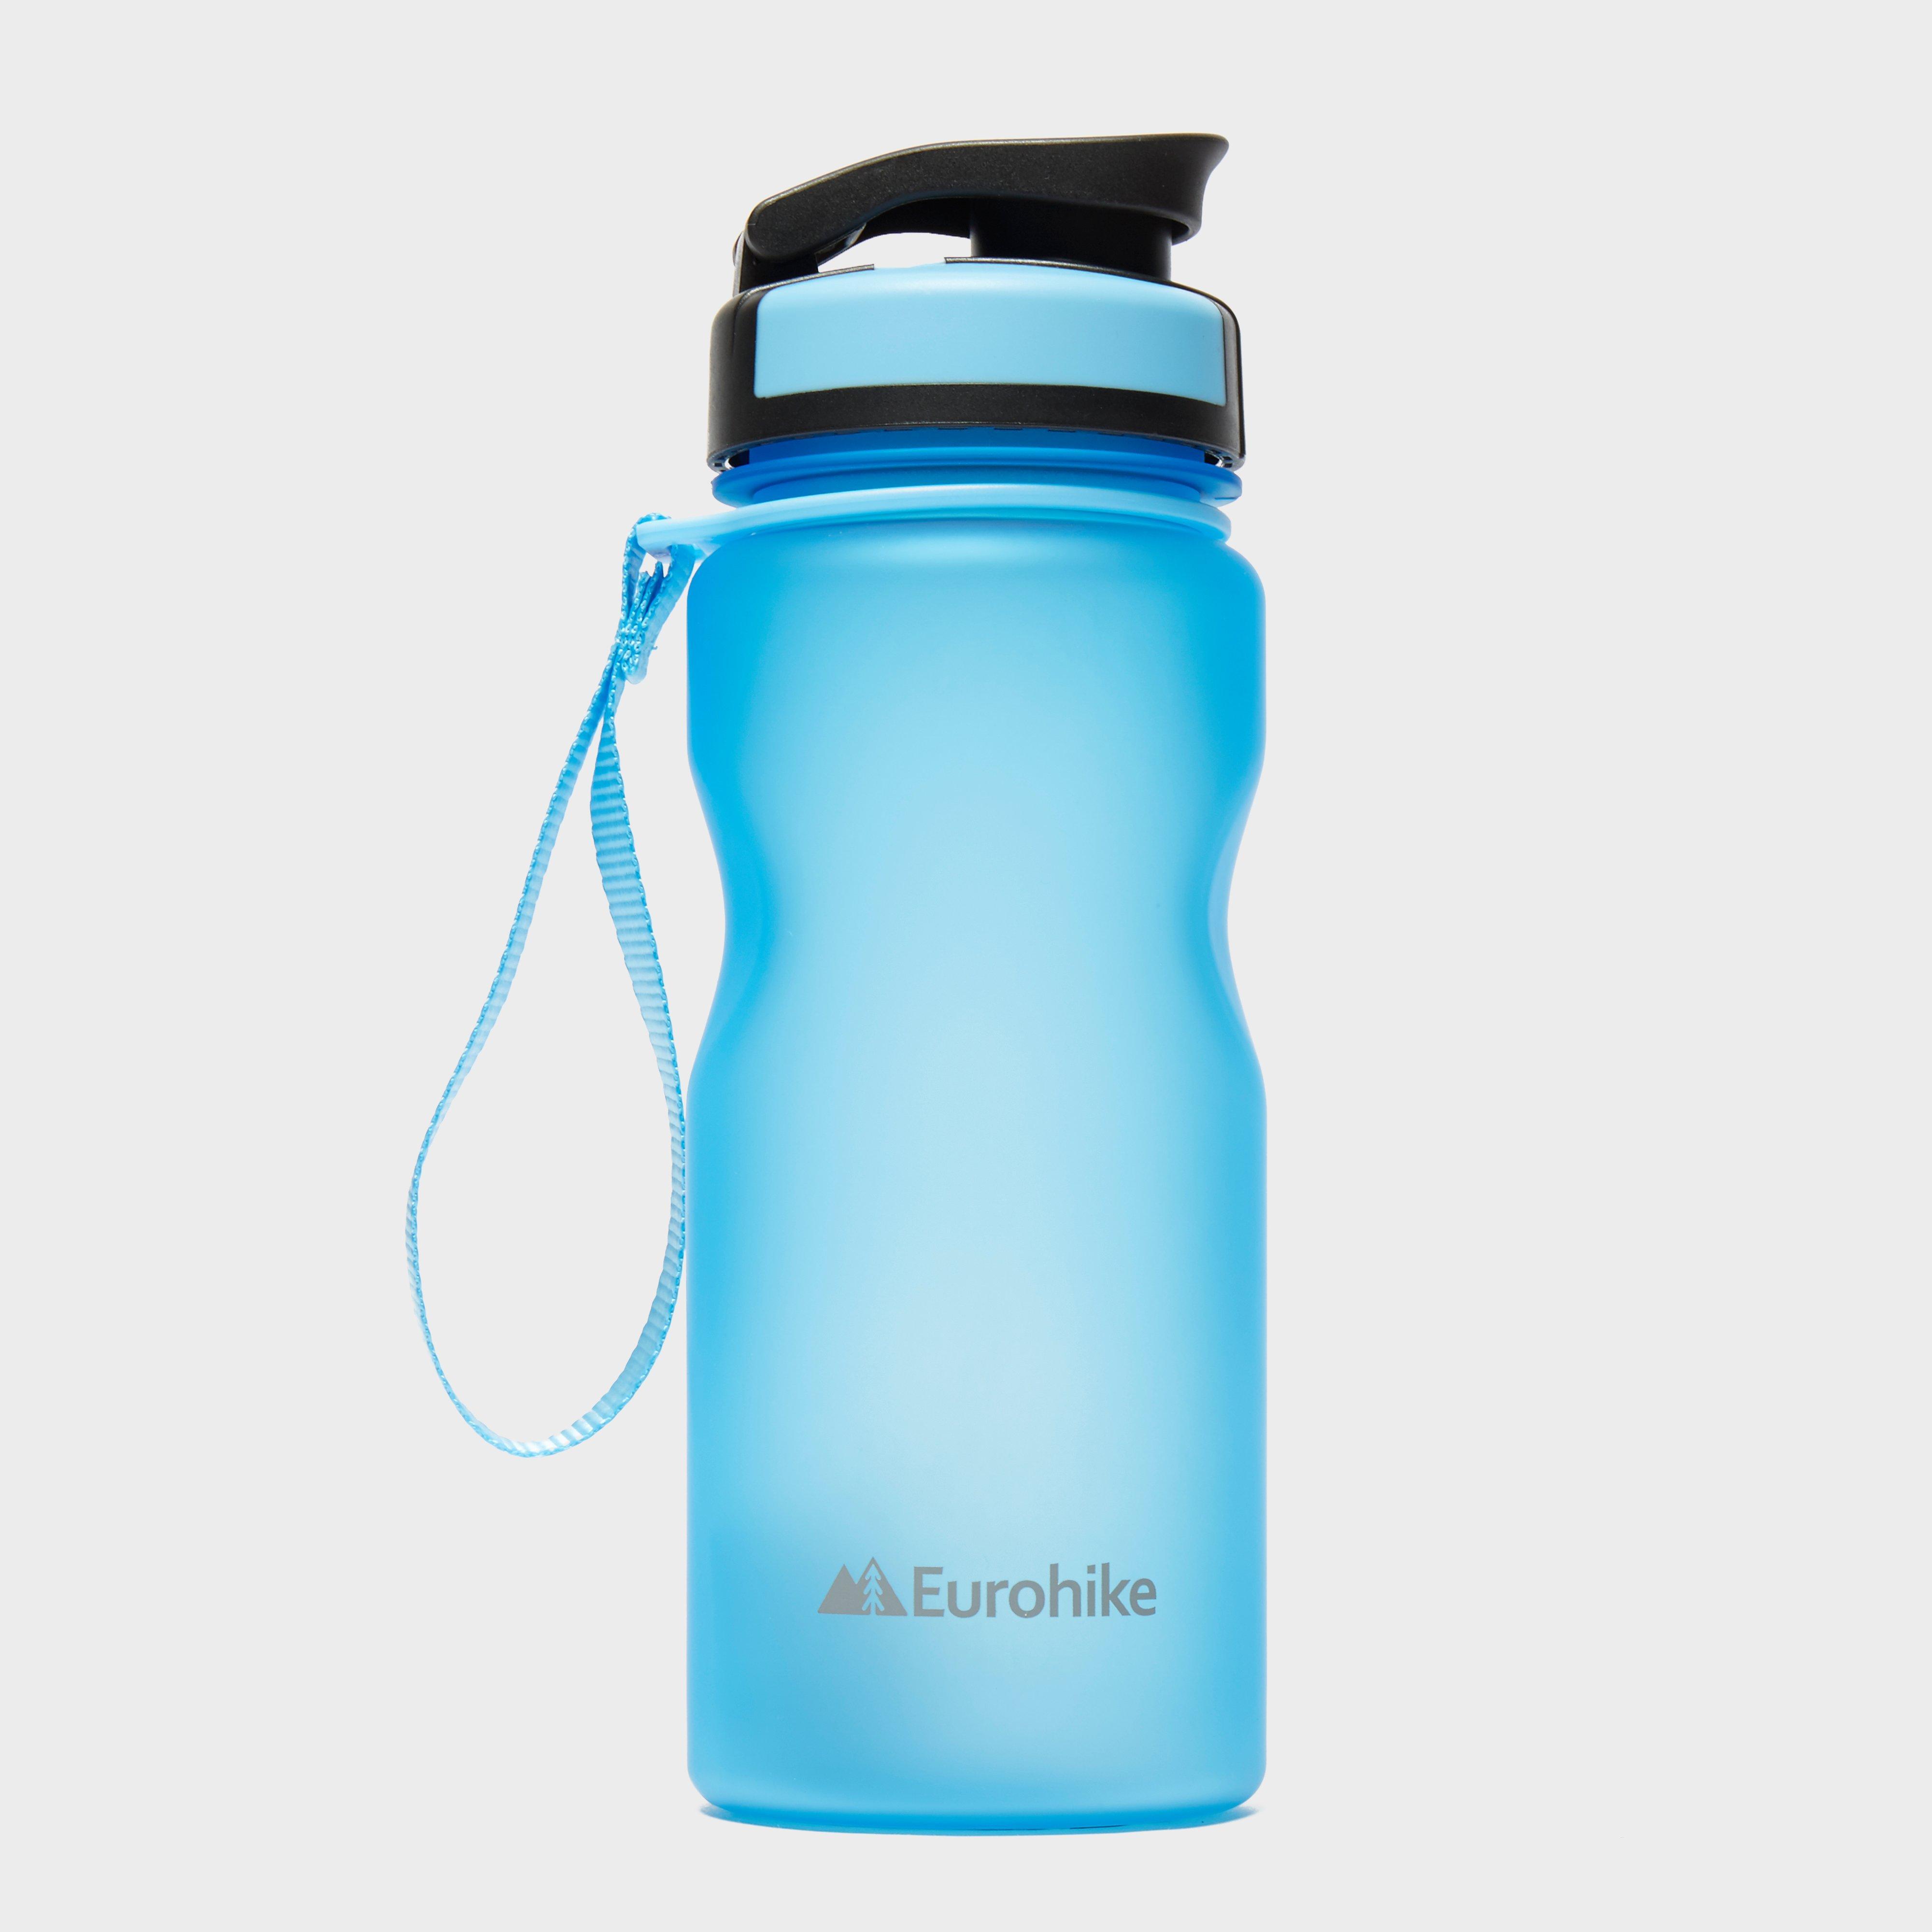 Eurohike Flip Bottle 650ml - Blue/lbl  Blue/lbl